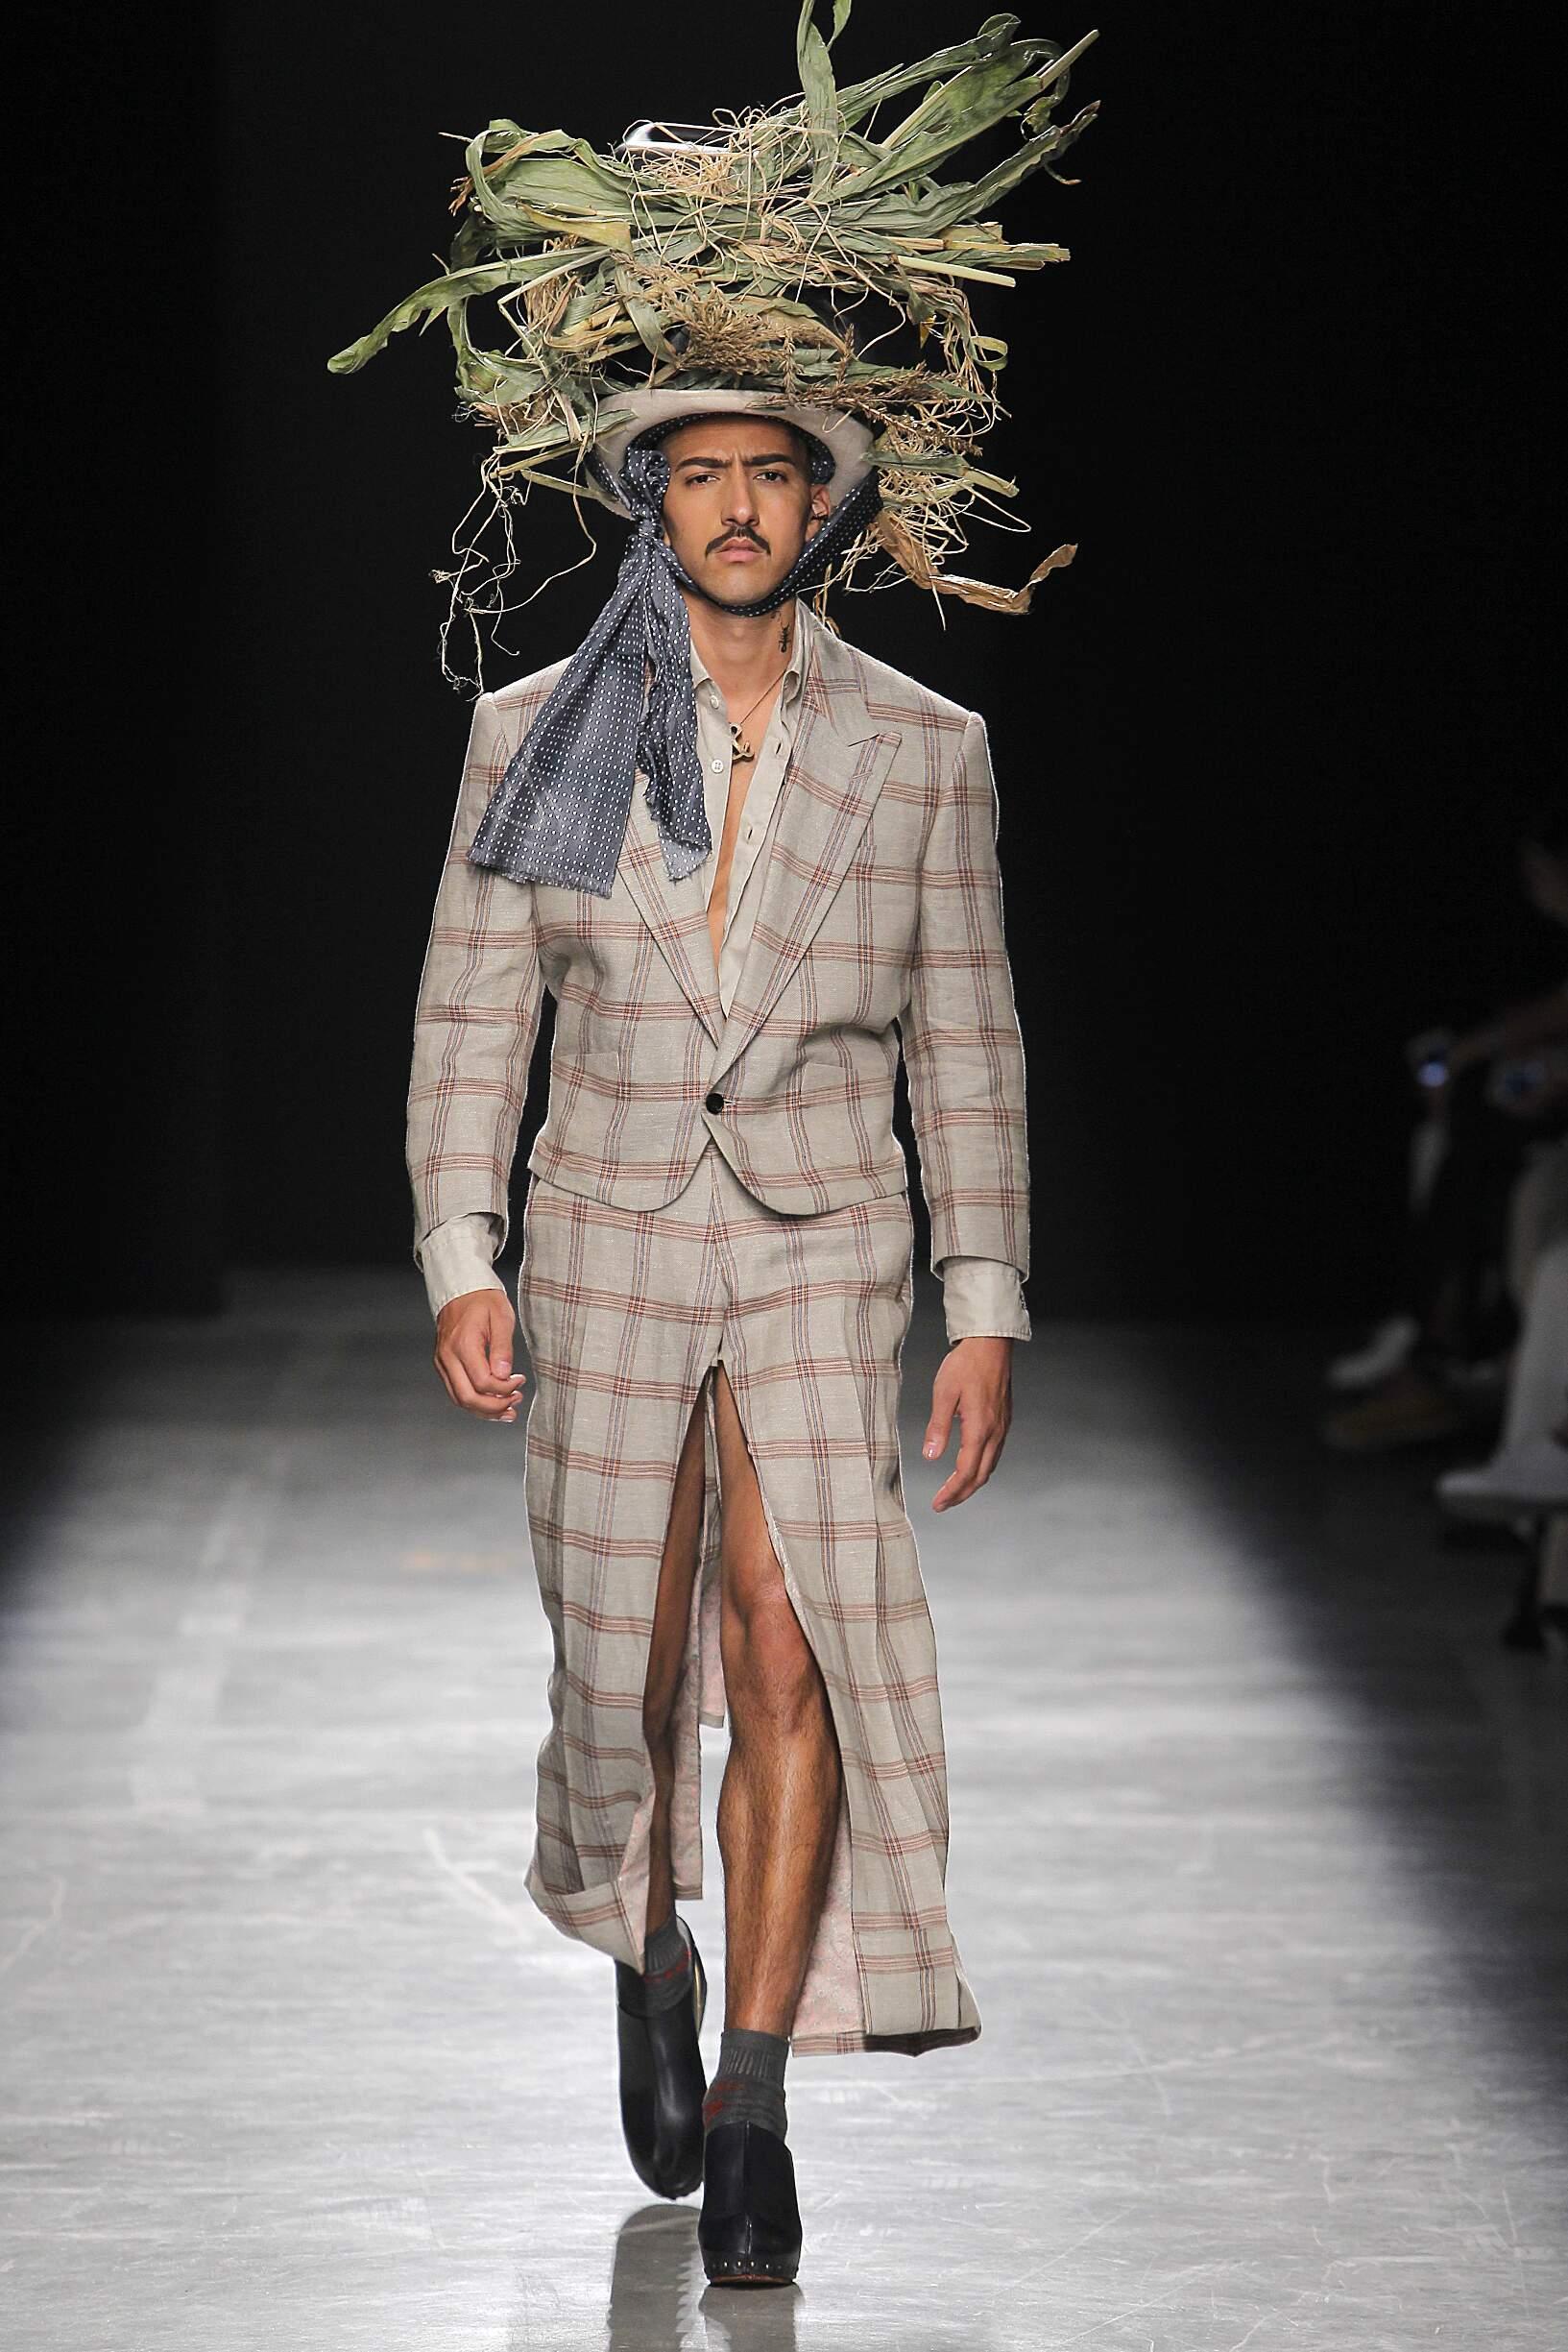 Man Fashion 2017 Catwalk Andreas Kronthaler for Vivienne Westwood